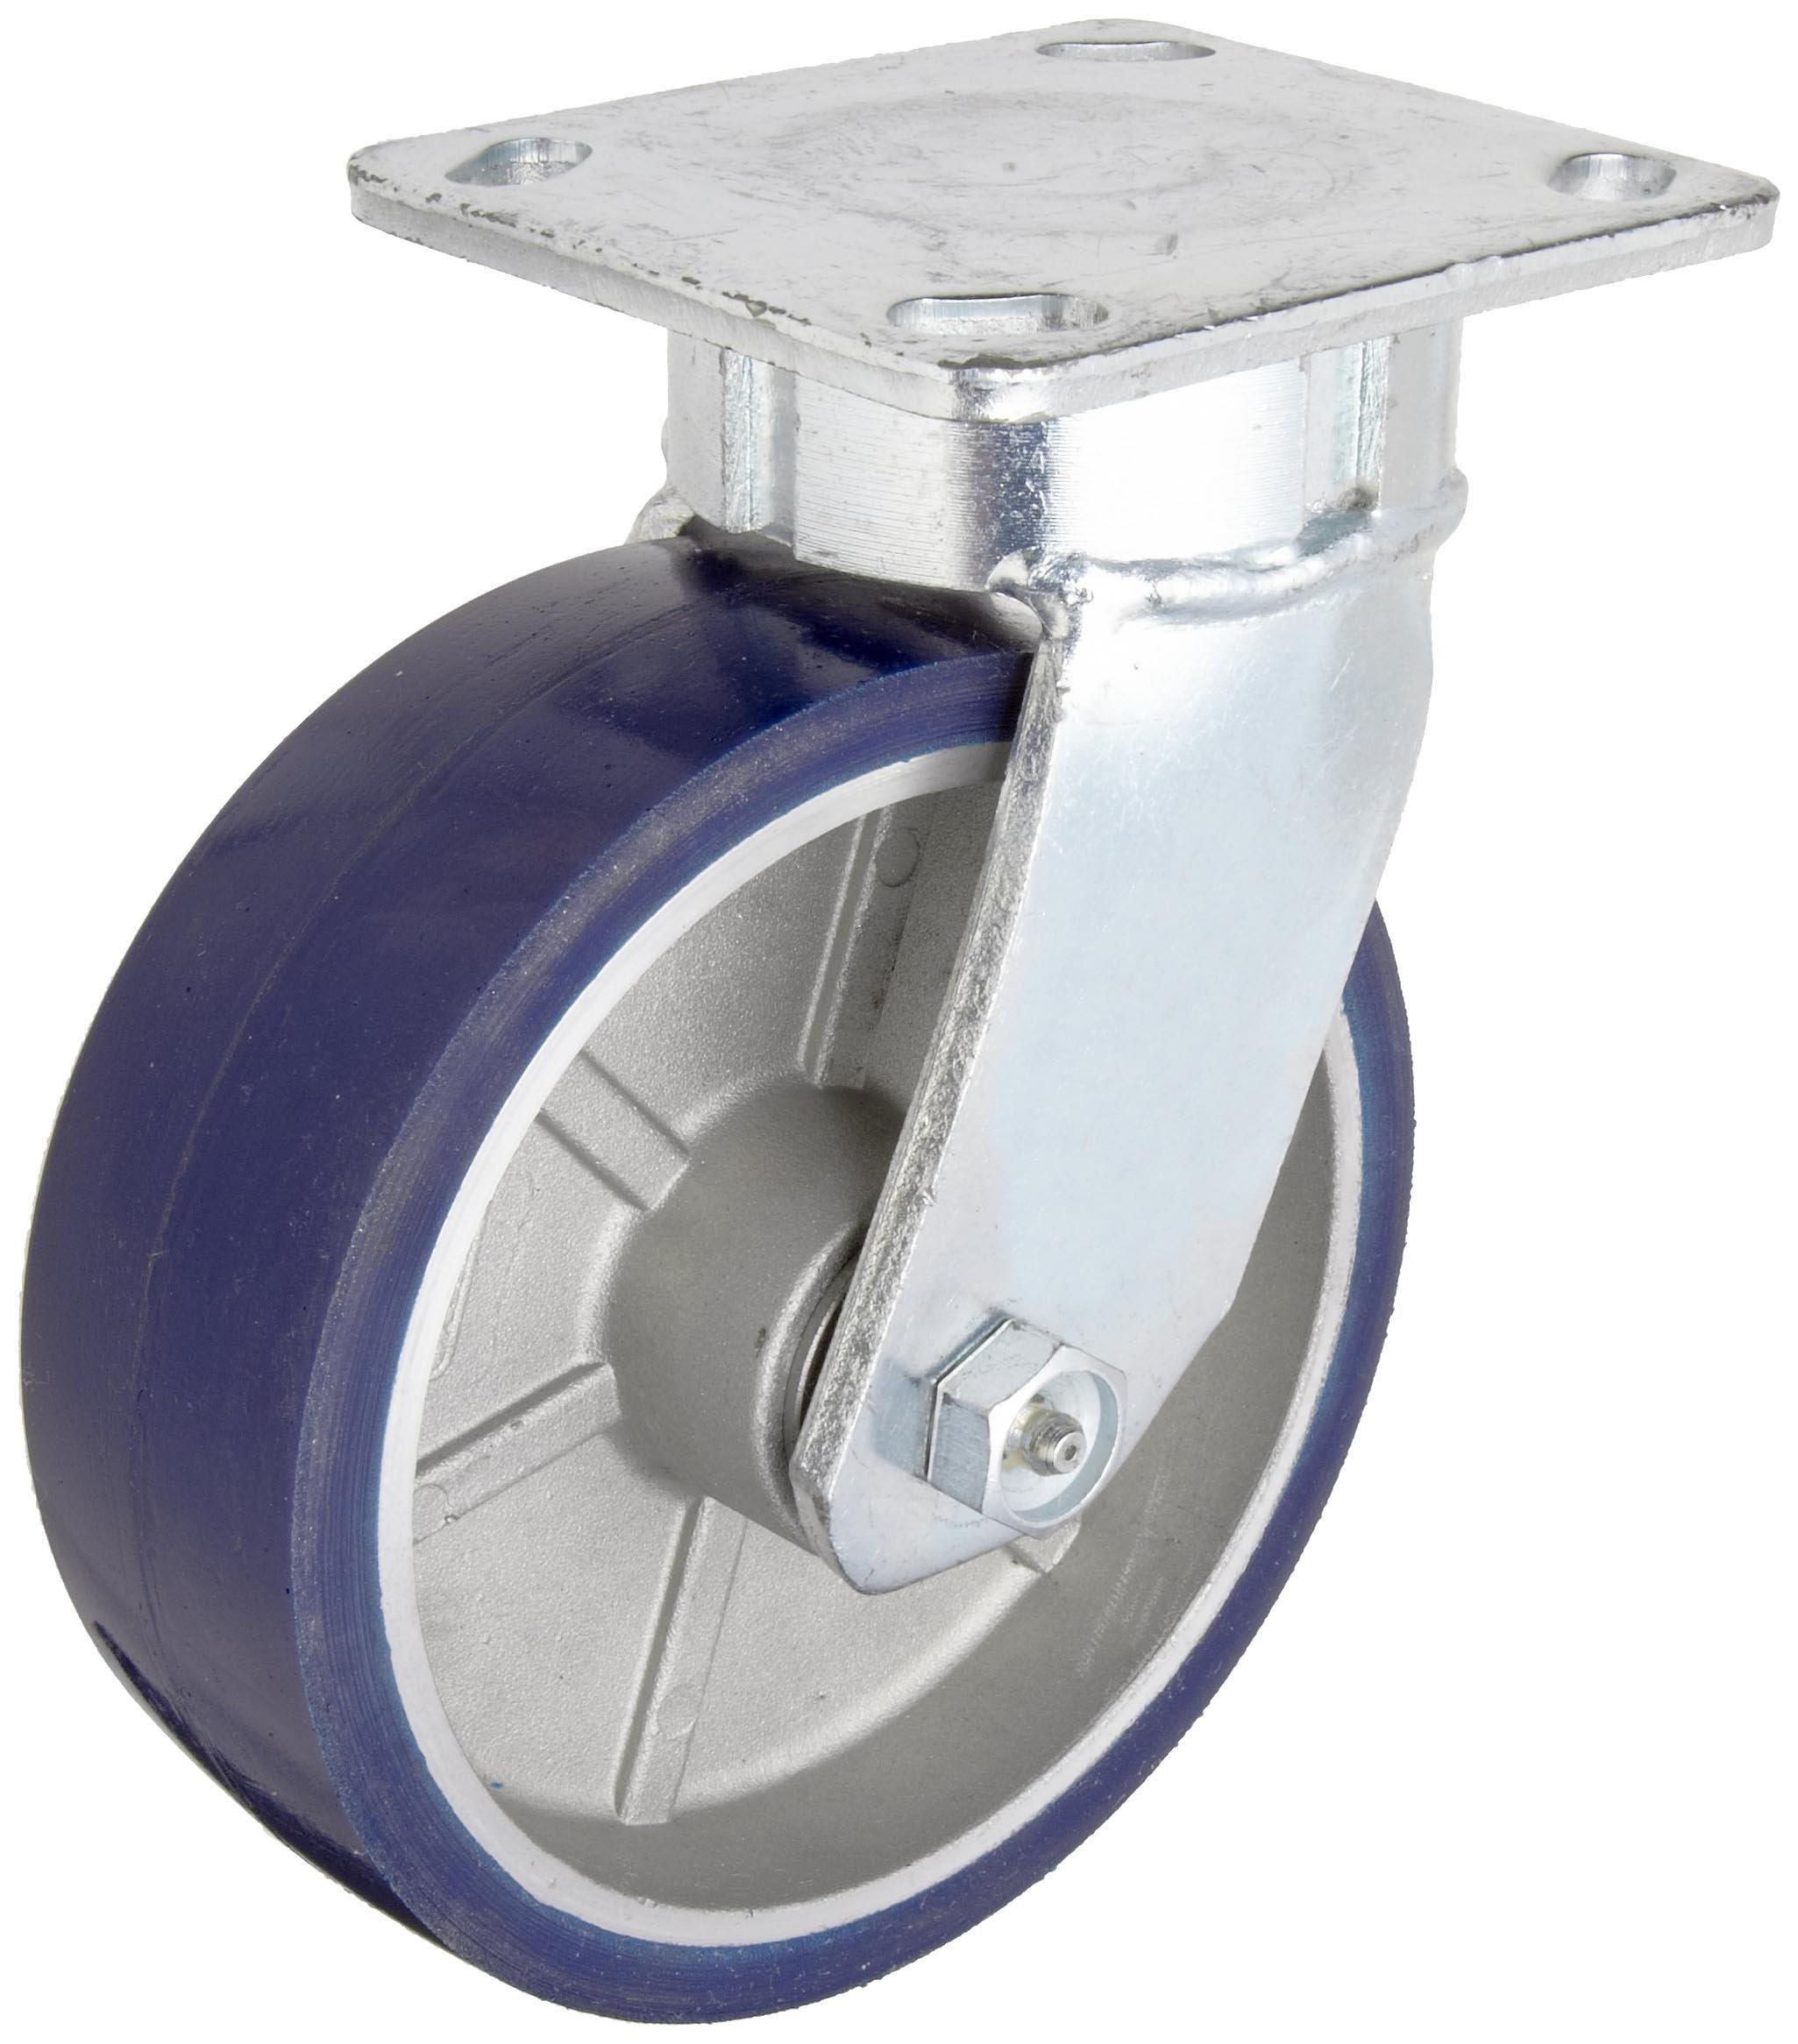 RWM Casters Freedom 48 Series Plate Caster, Swivel, Urethane on Aluminum Wheel, Roller Bearing, 1230 lbs Capacity, 6'' Wheel Dia, 2'' Wheel Width, 7-1/2'' Mount Height, 4-1/2'' Plate Length, 4'' Plate Width